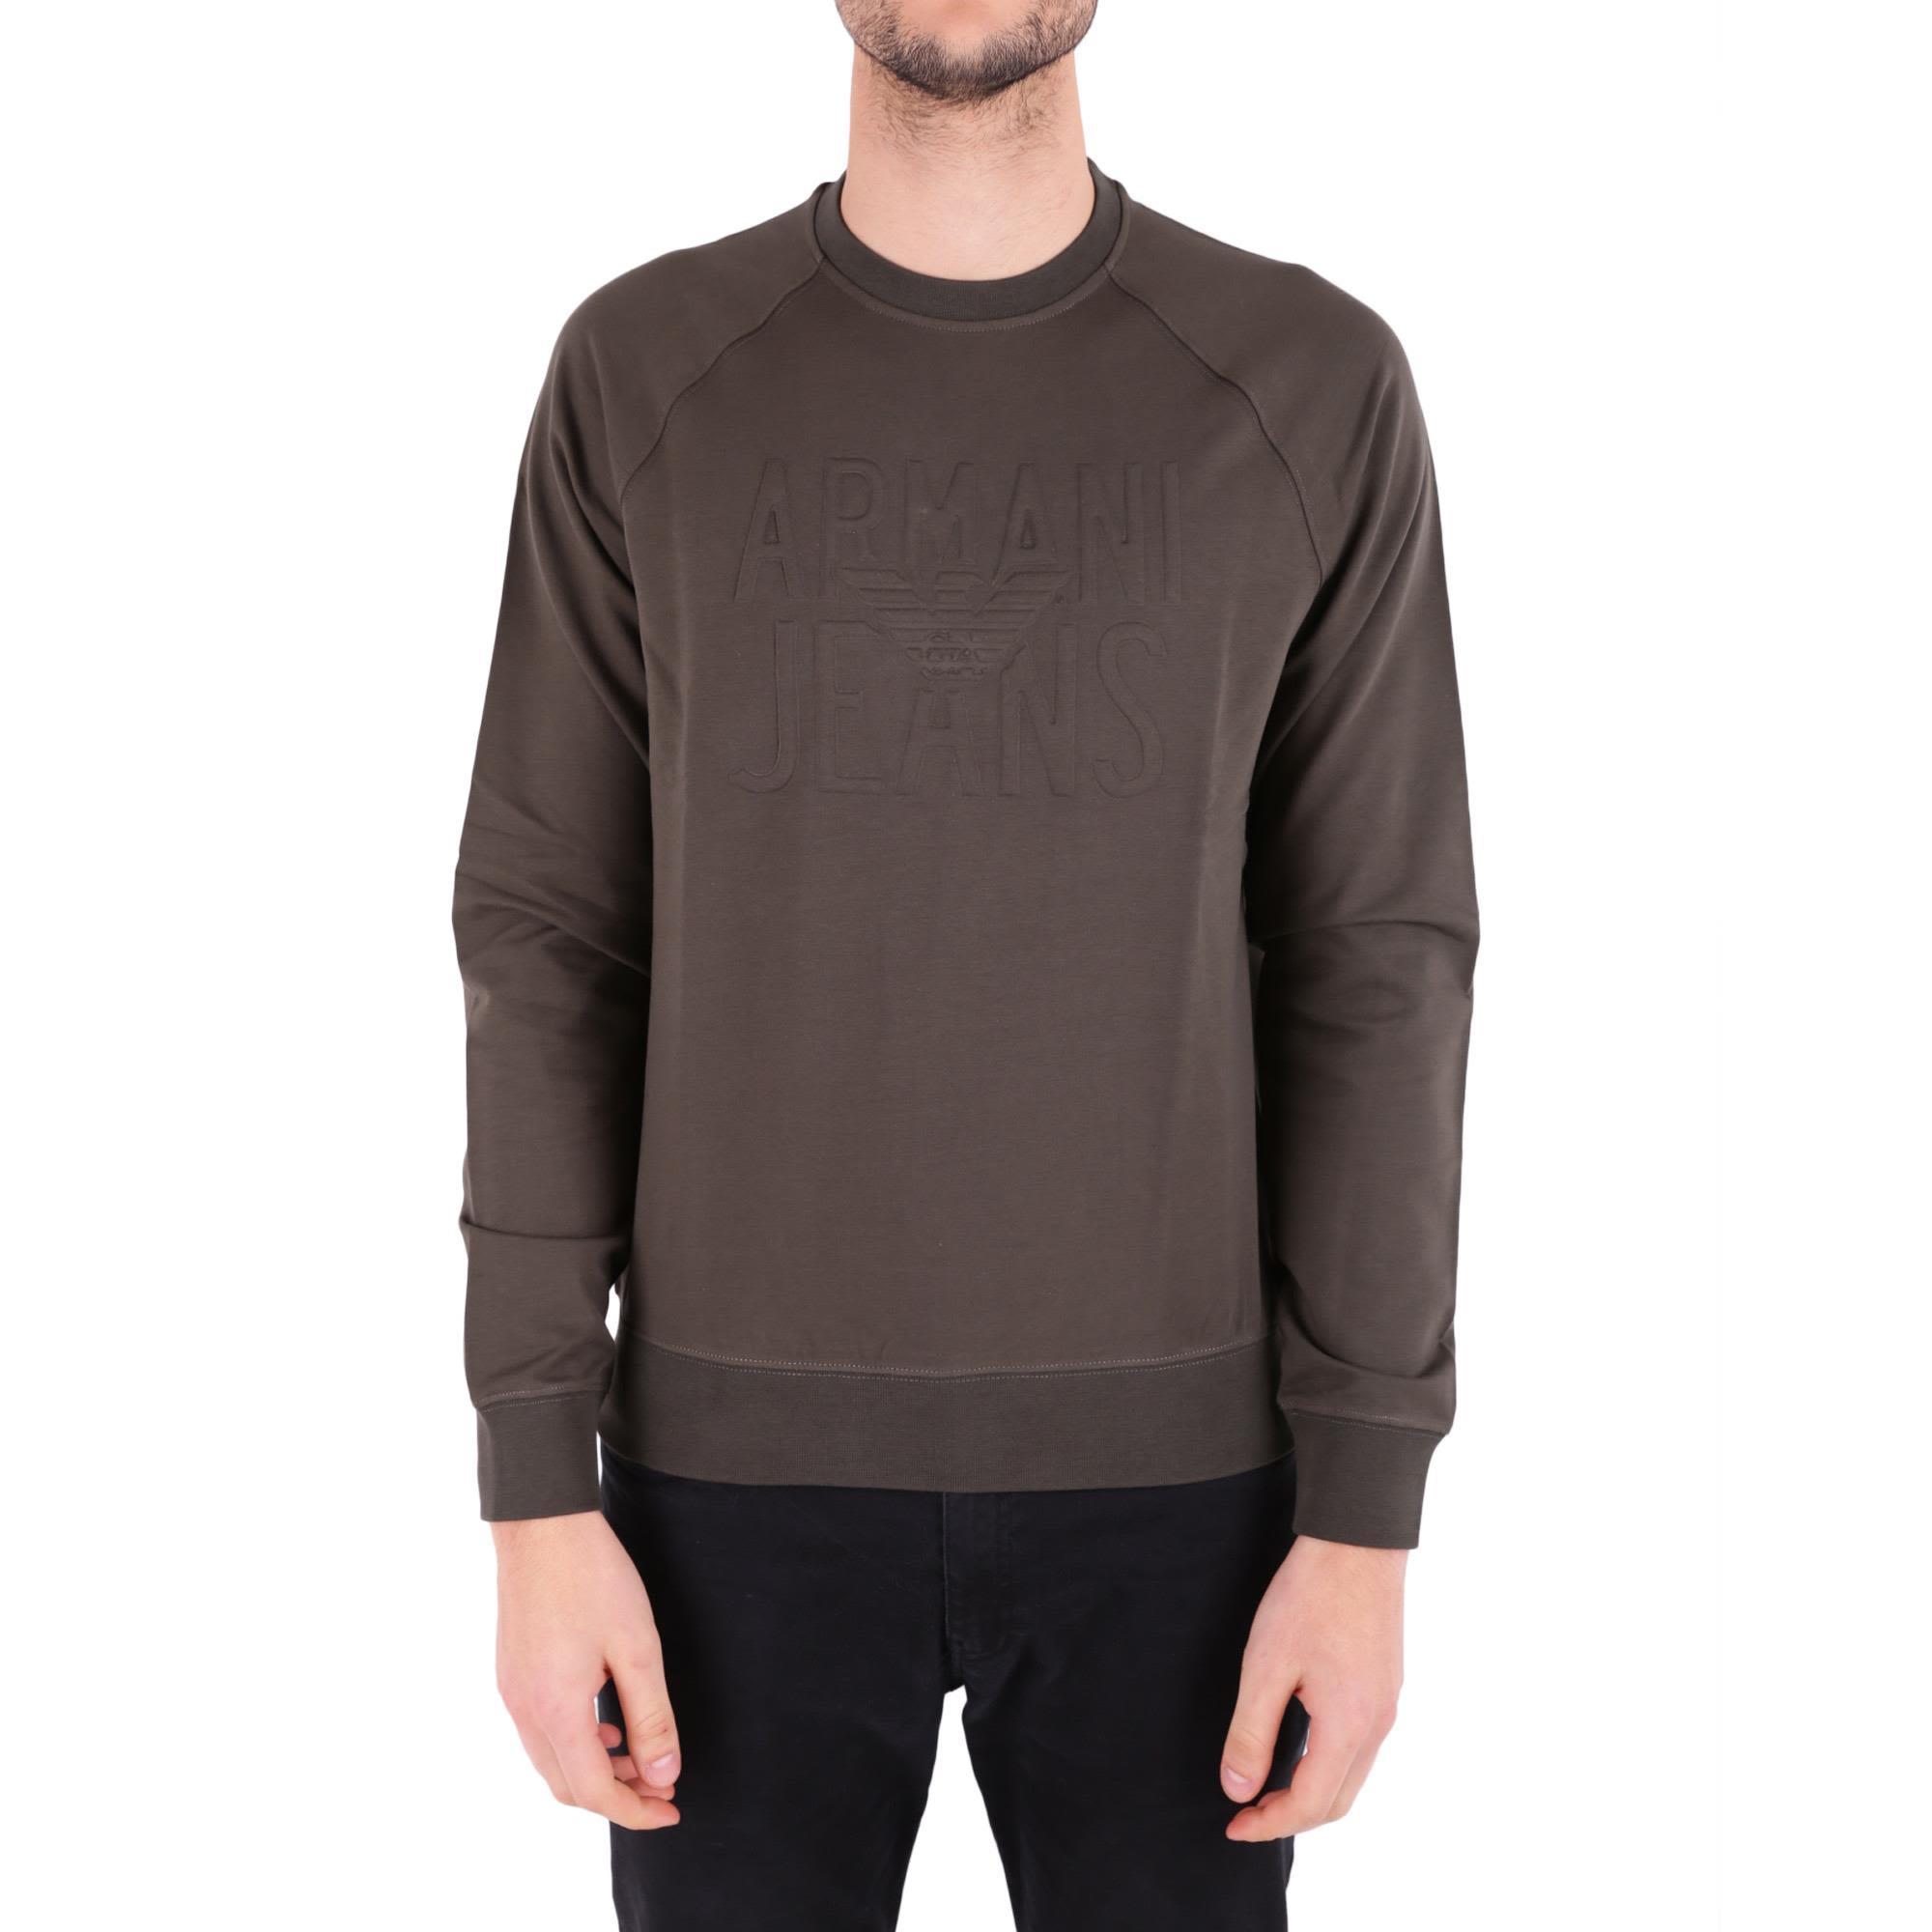 Armani Jeans Cotton Blend Sweatshirt